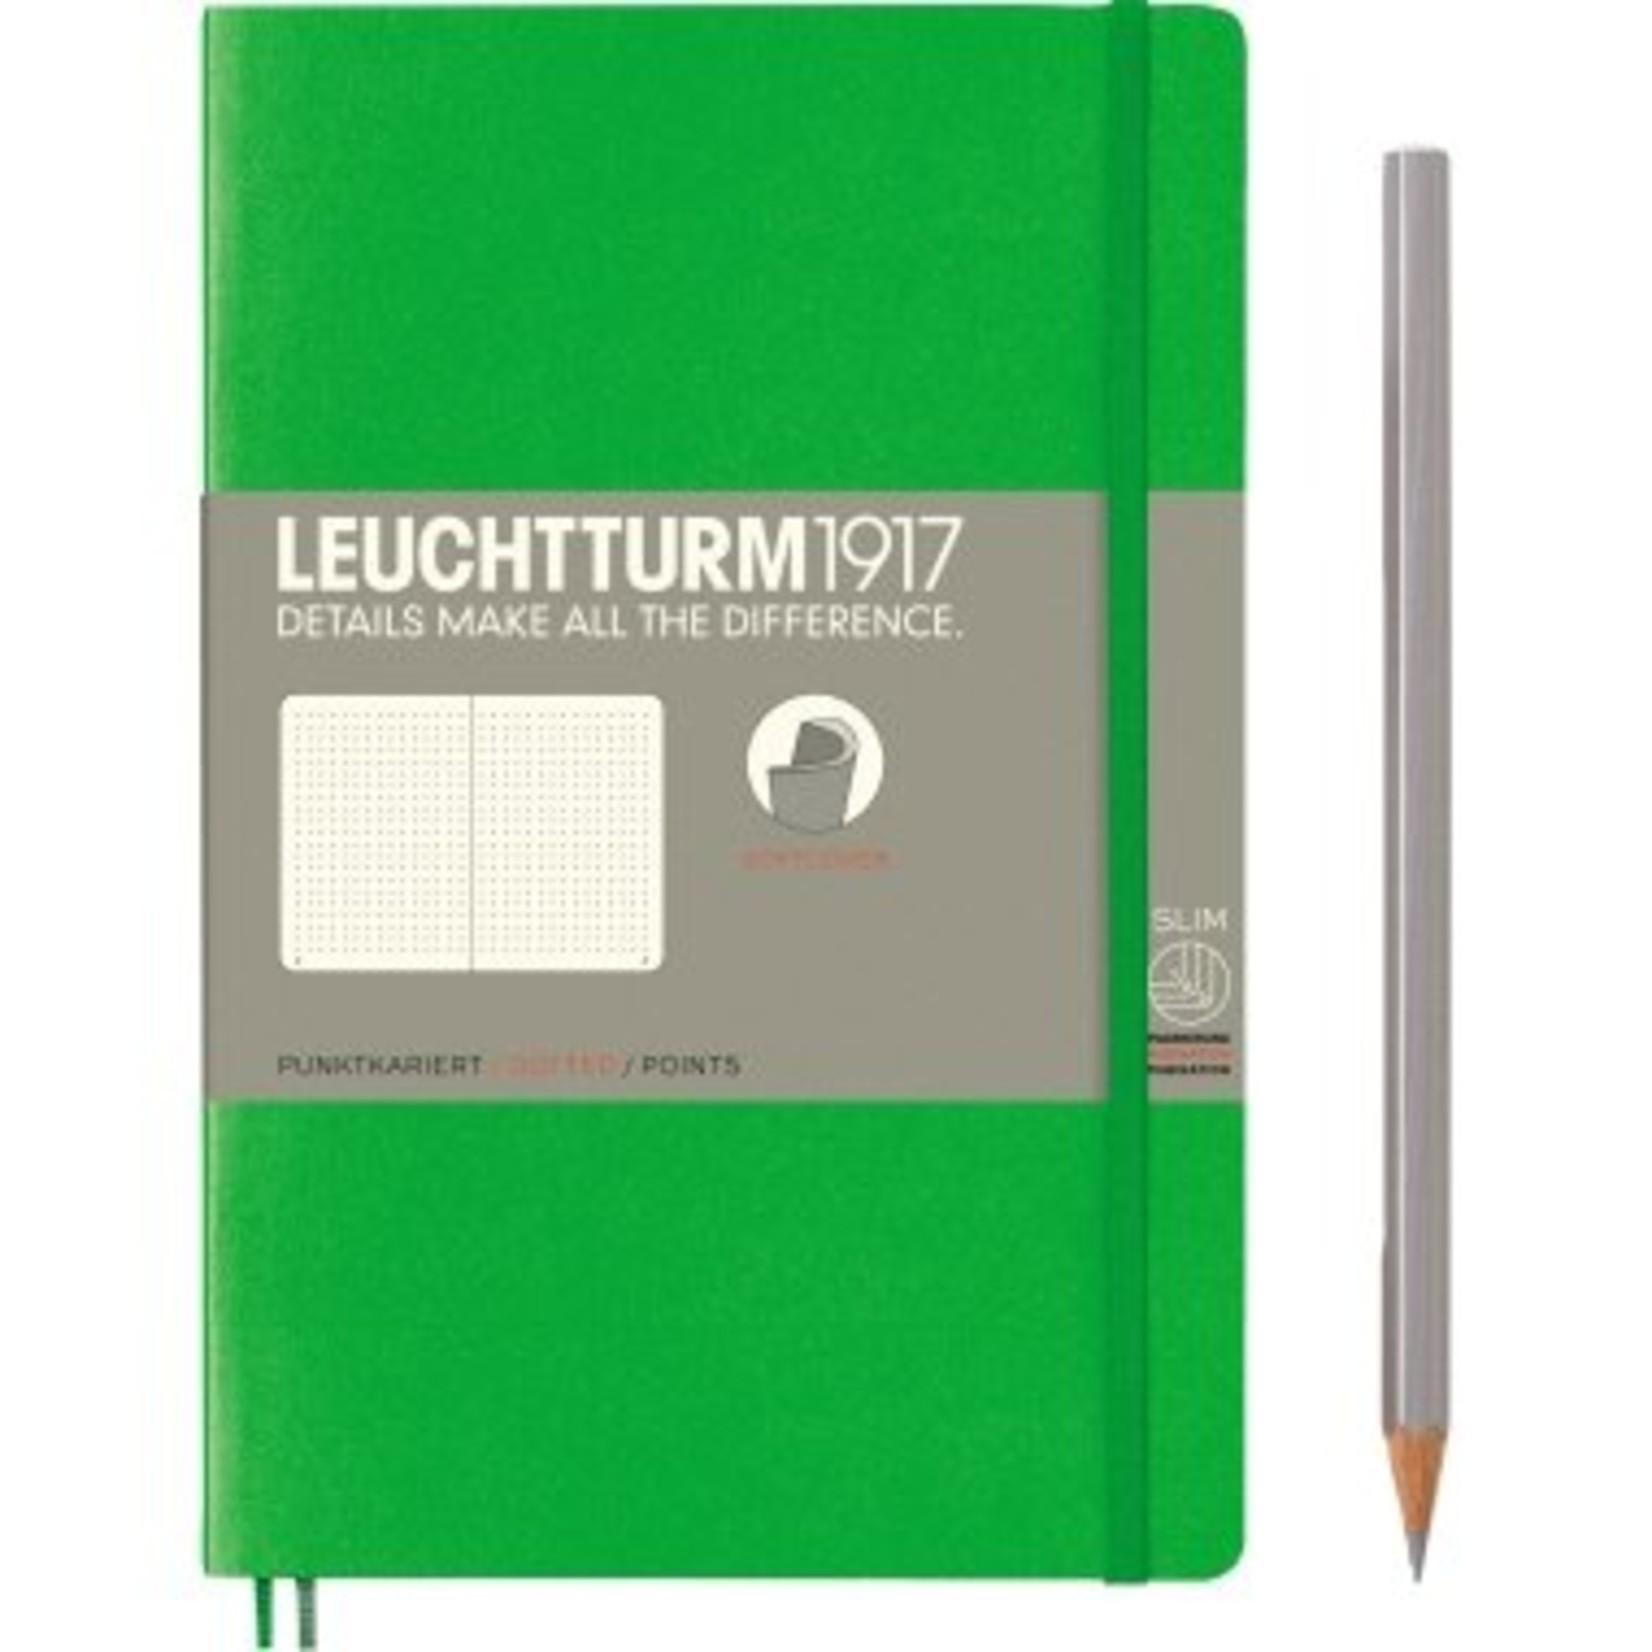 Leuchtturm1917 LT NB B6 SC Paperback Fresh Green Dotted